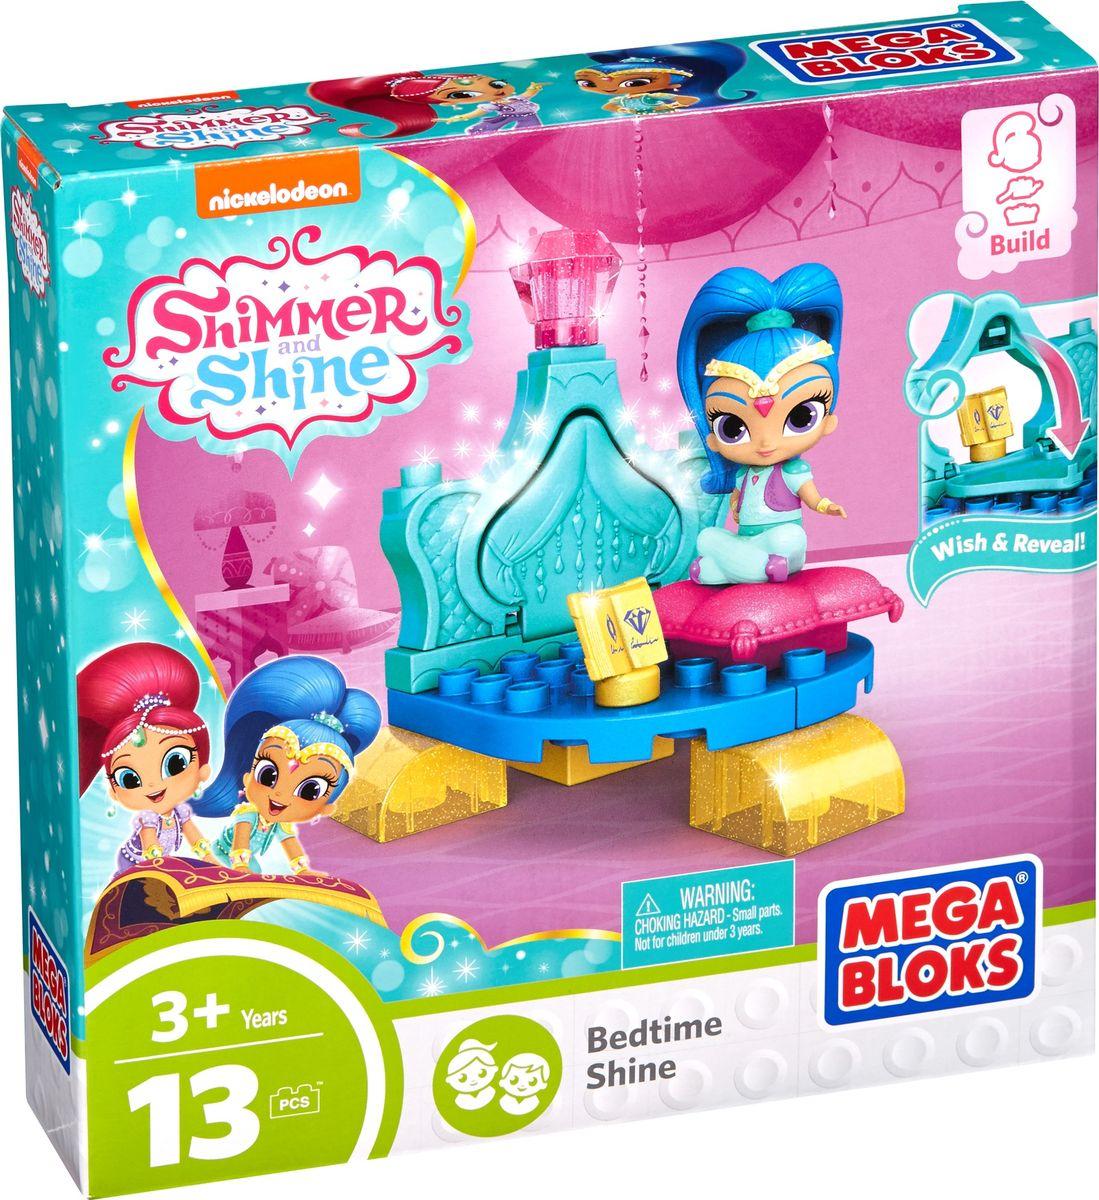 Mega Bloks Shimmer & Shine Конструктор Bedtime Shine shimmer & shine набор фигурок тала и нала